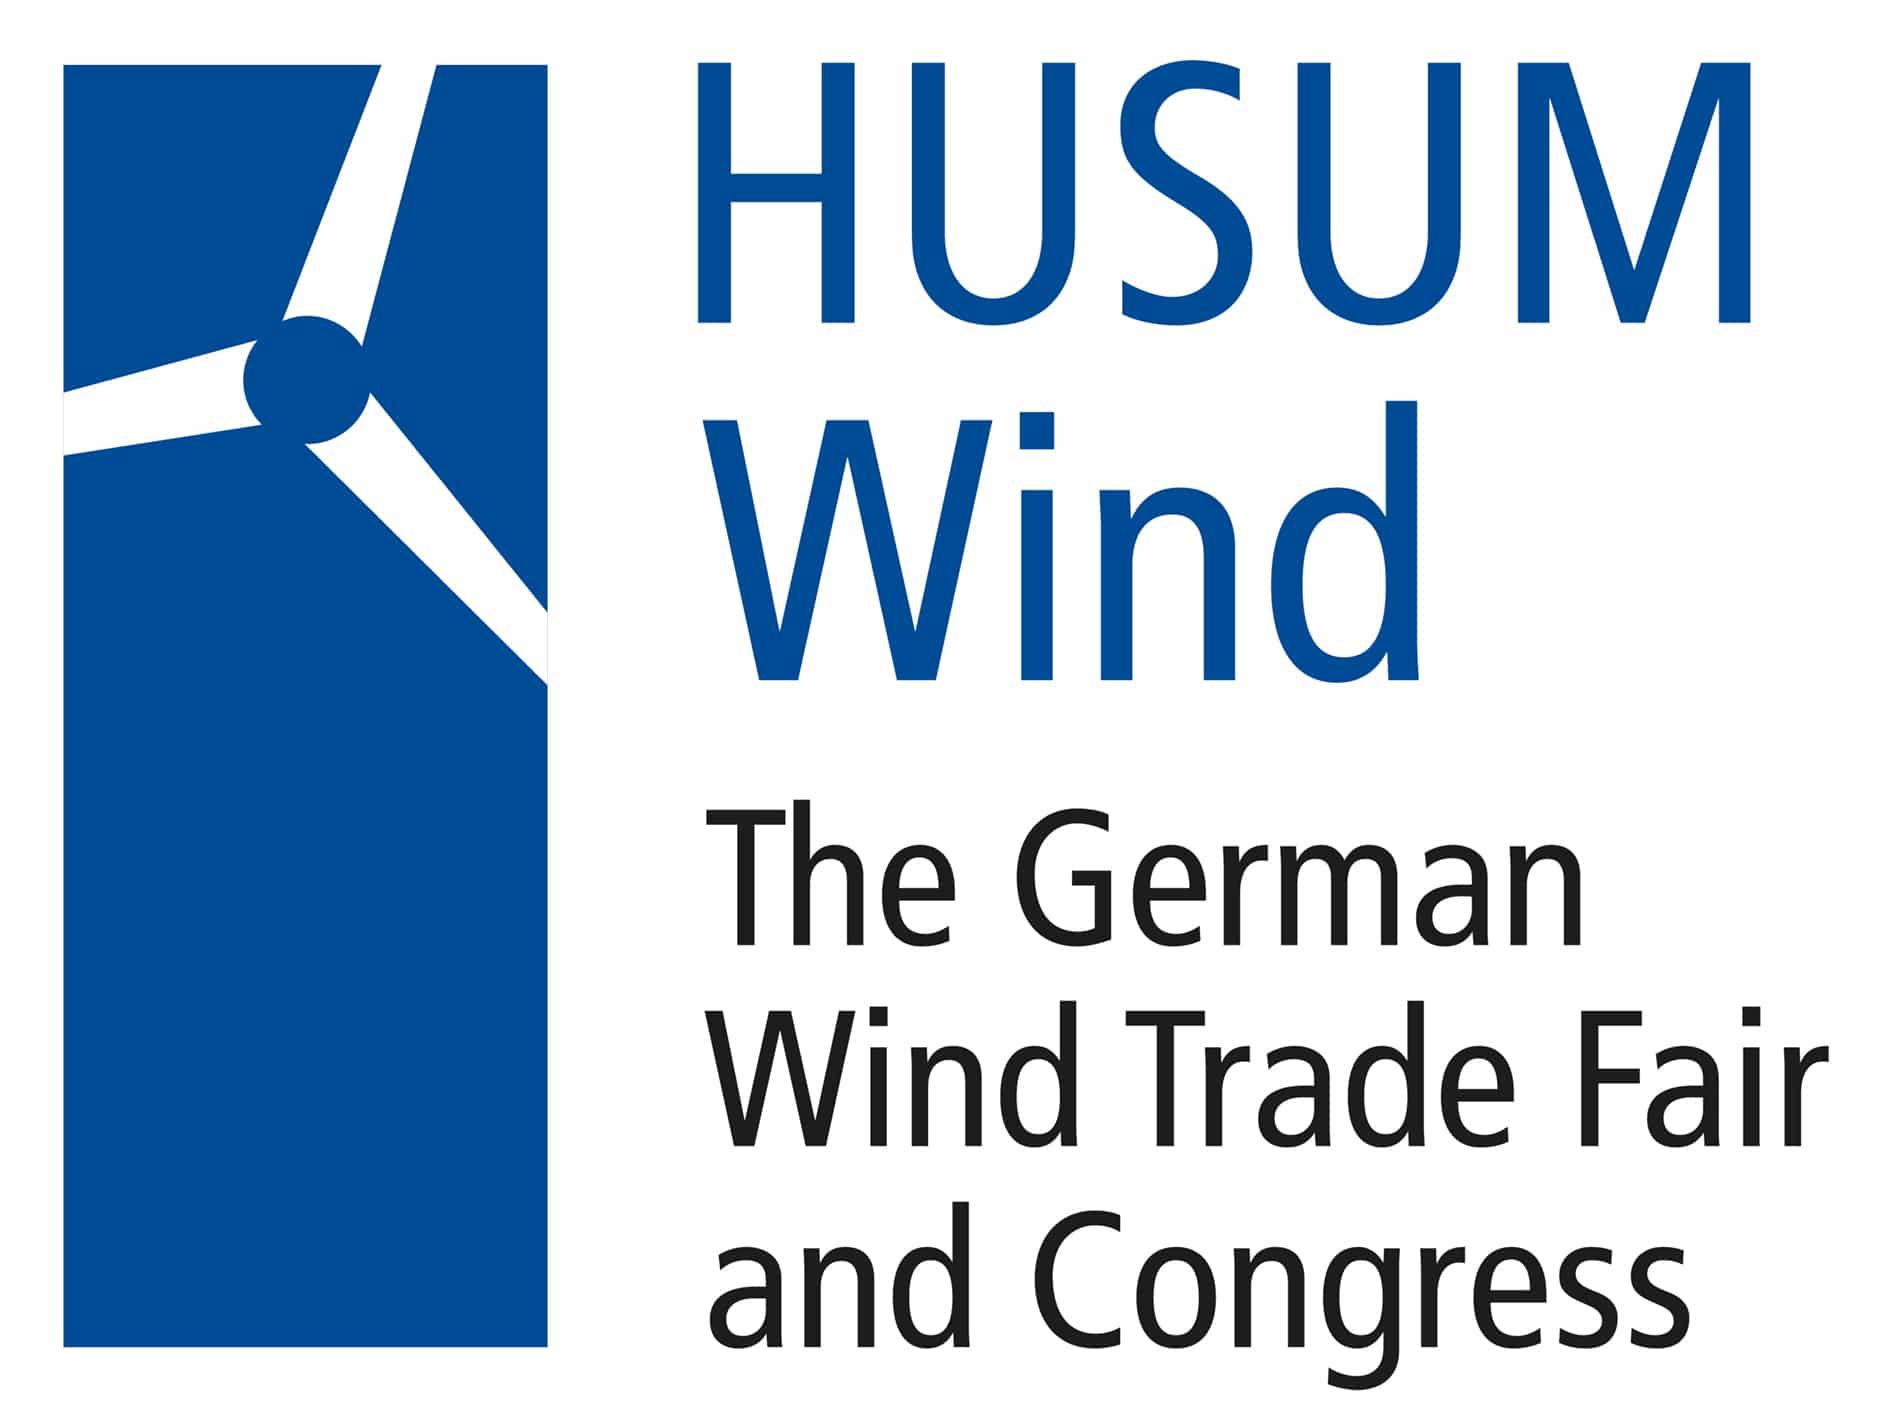 Anker Foundations Fertigteil-Fundament - Messe Husum Wind